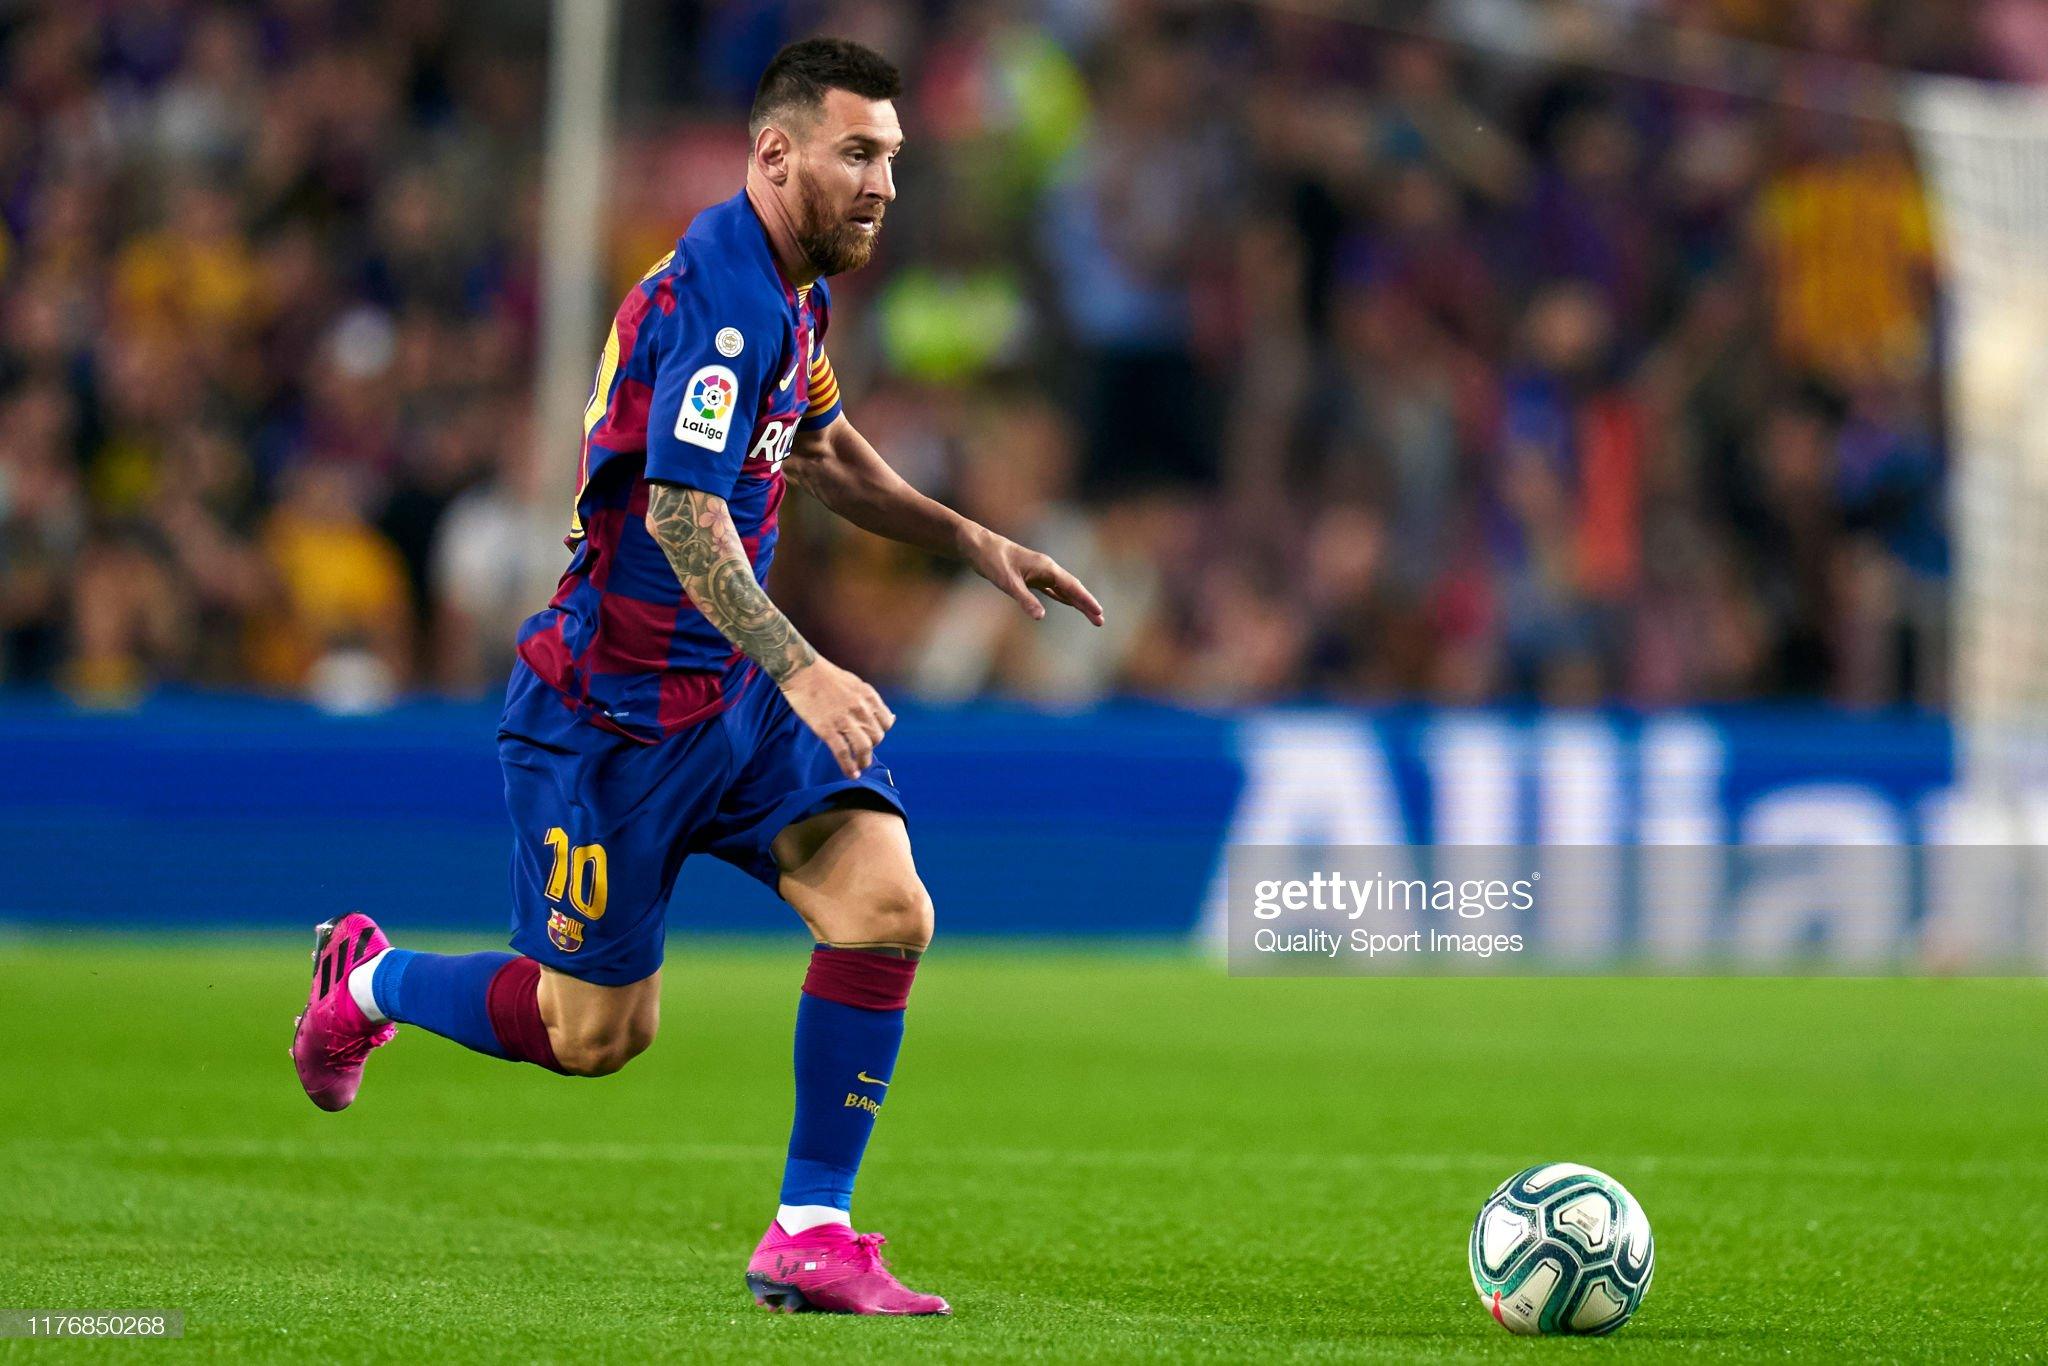 صور مباراة : برشلونة - فياريال 2-1 ( 24-09-2019 )  Lionel-messi-of-fc-barcelona-with-the-ball-during-the-liga-match-fc-picture-id1176850268?s=2048x2048